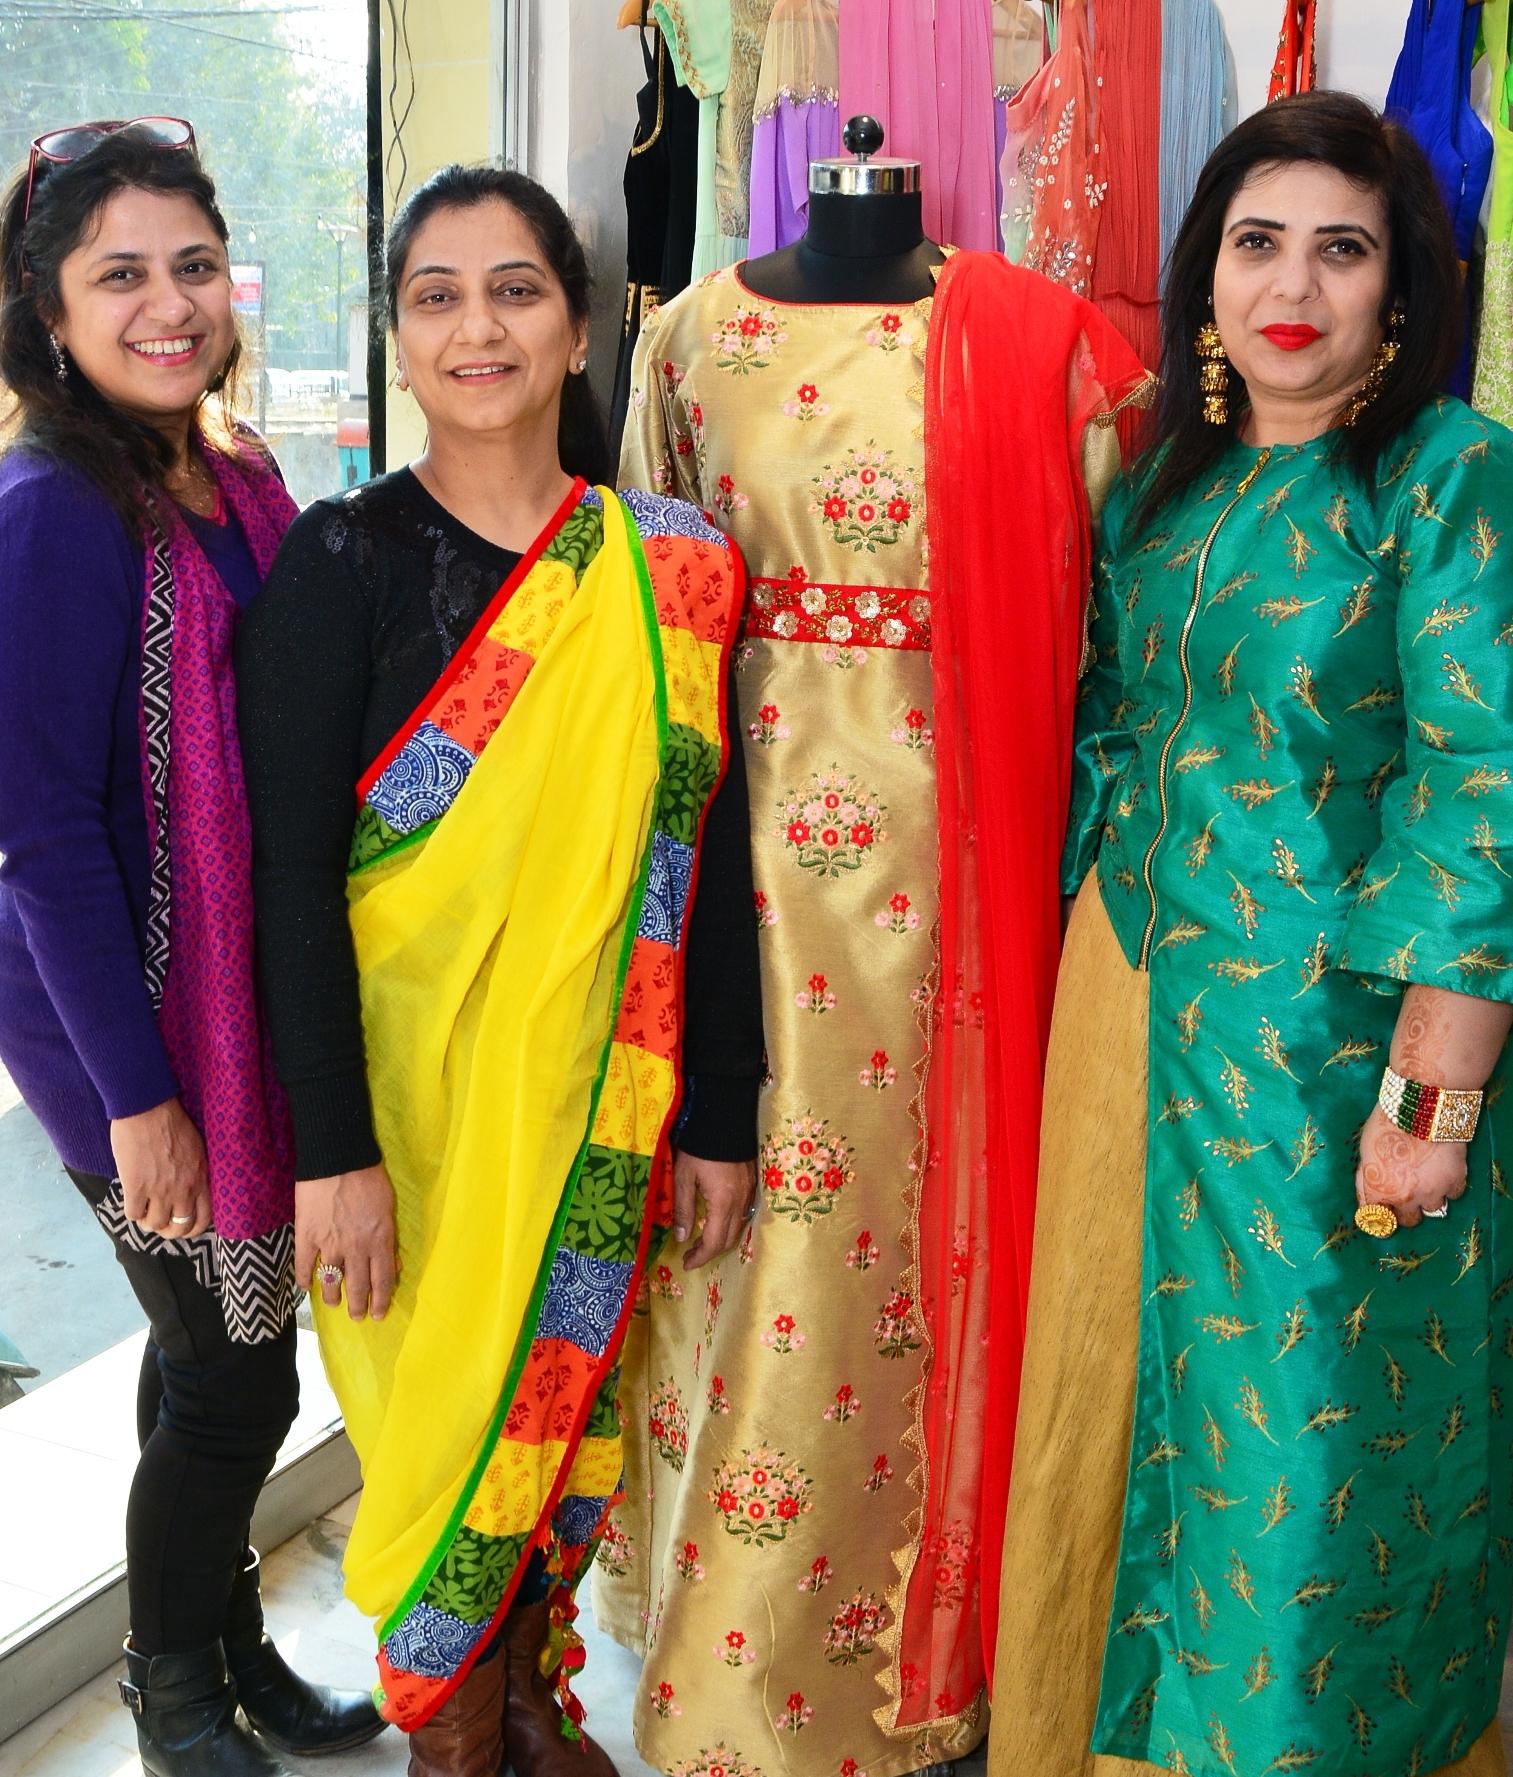 Chakra healing designer label unveiled